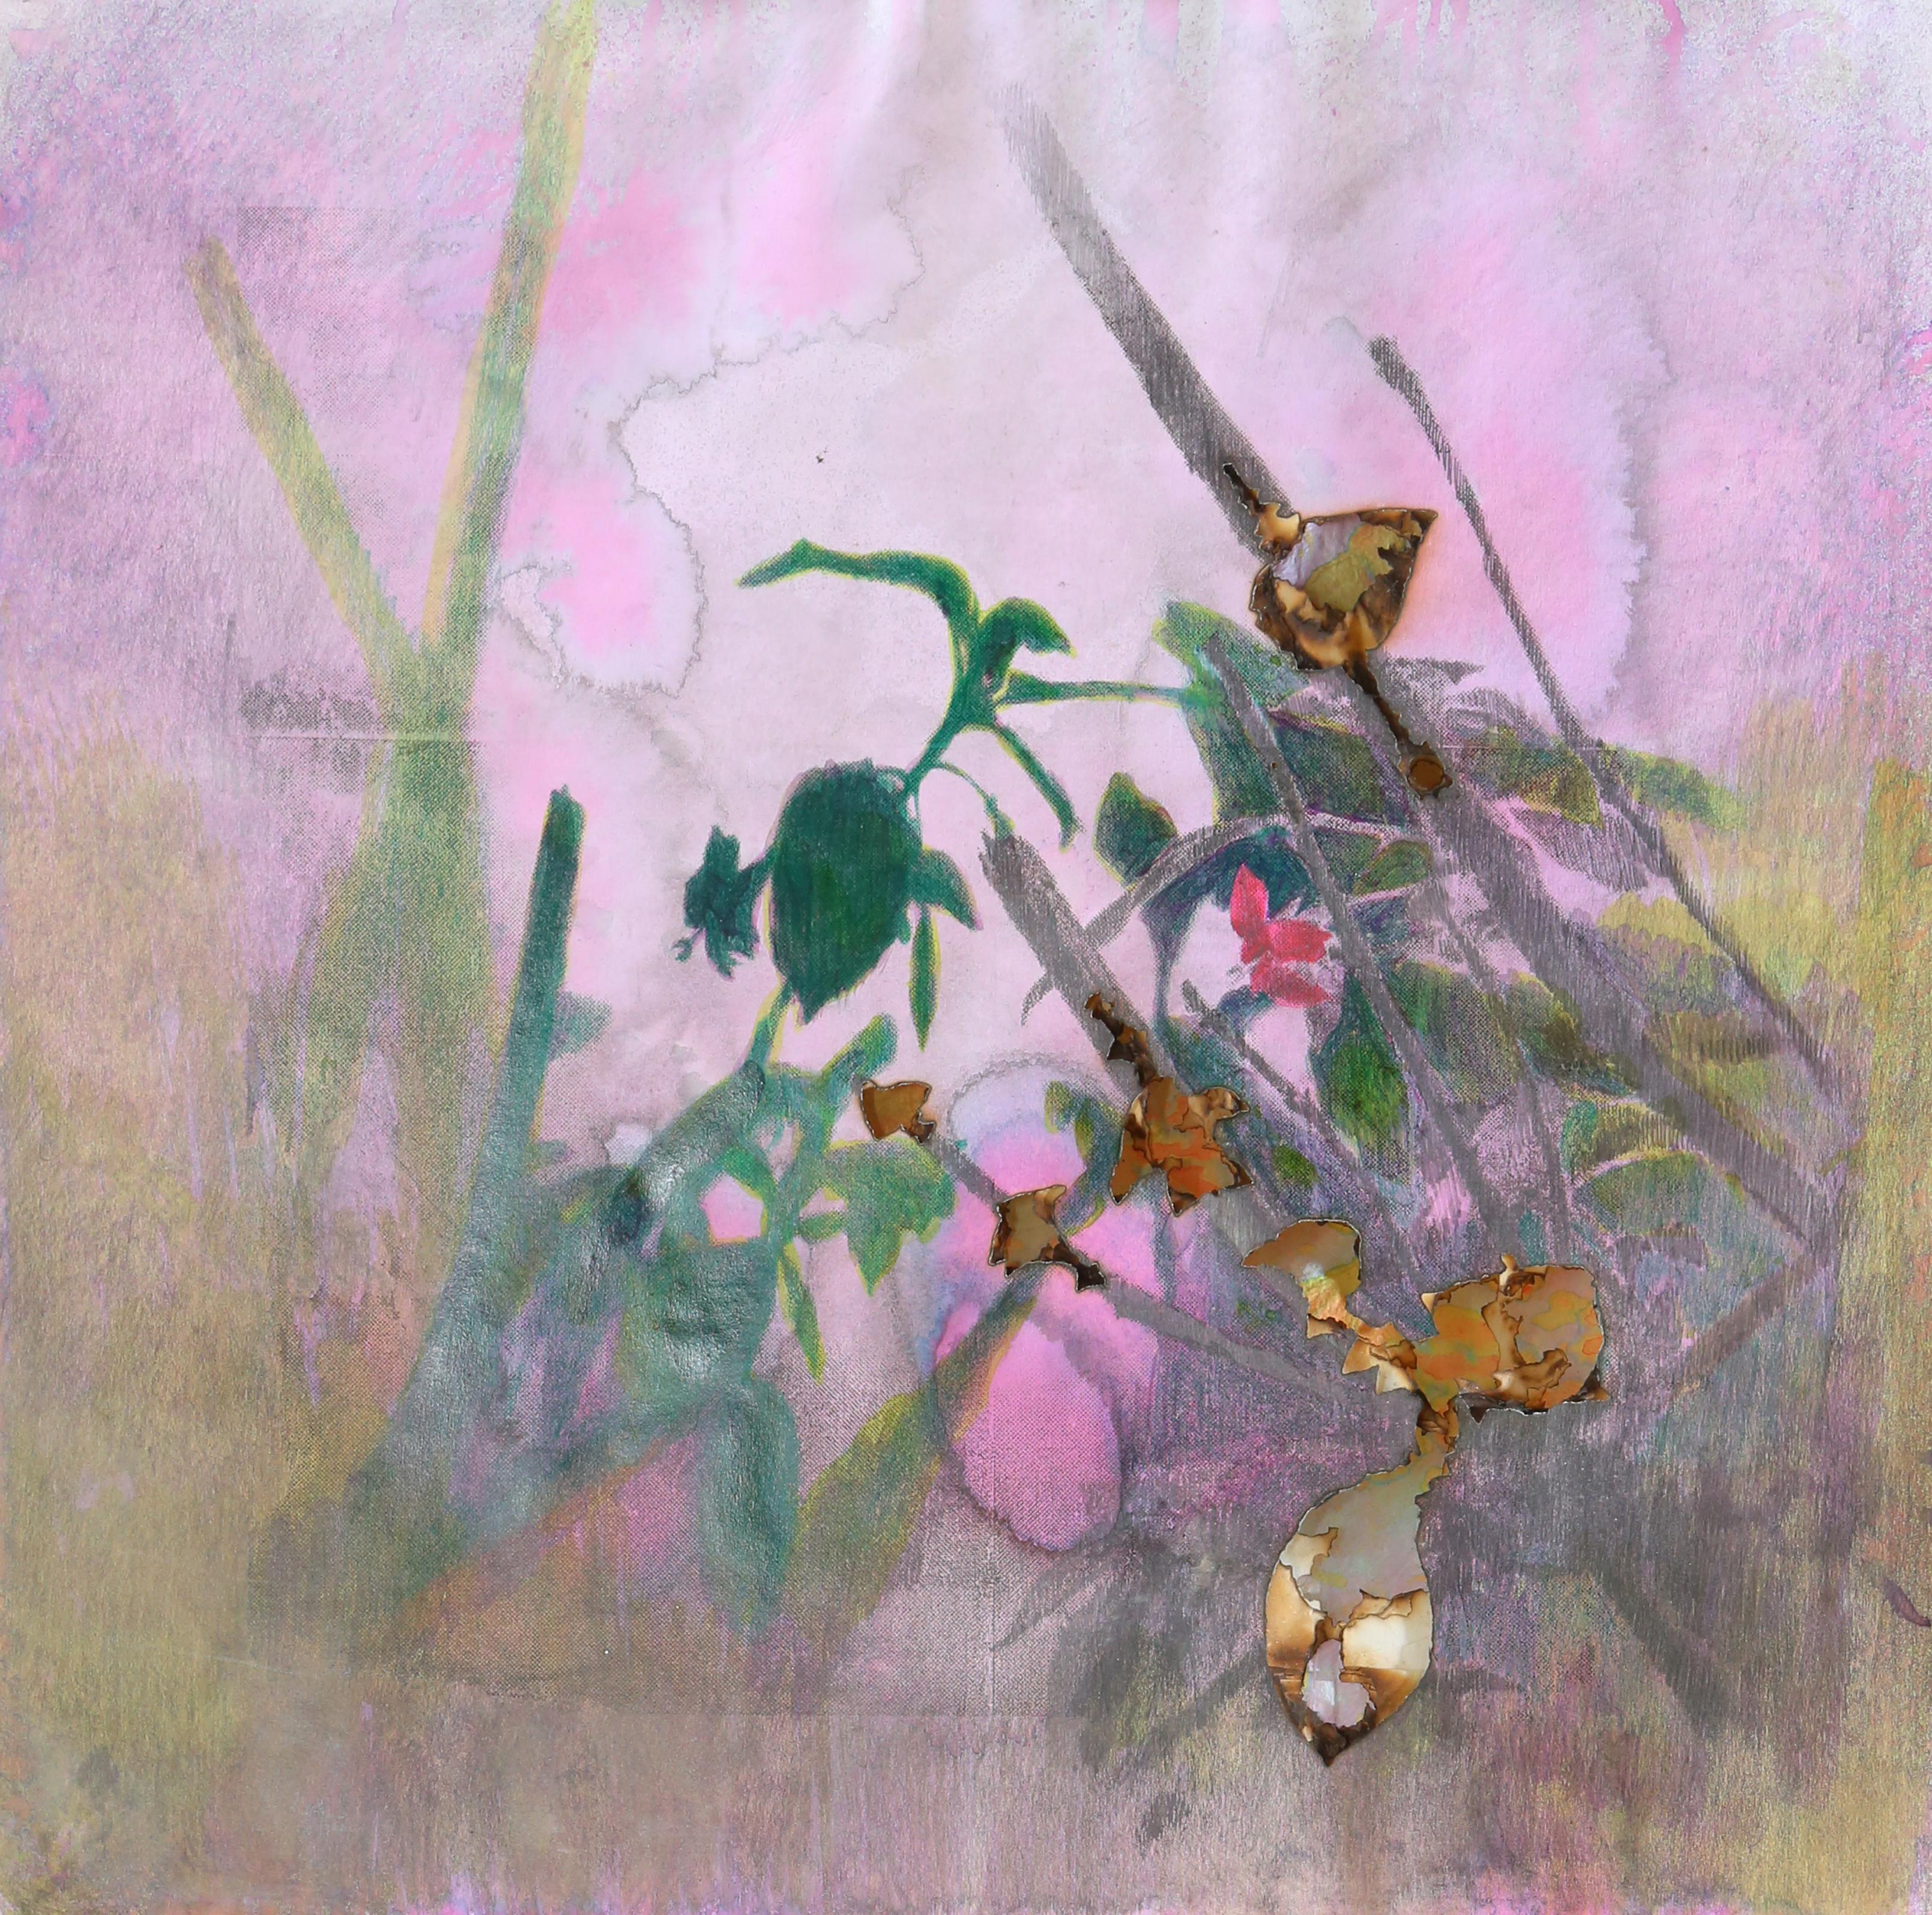 Le portrait des plante, Fuchsia 4